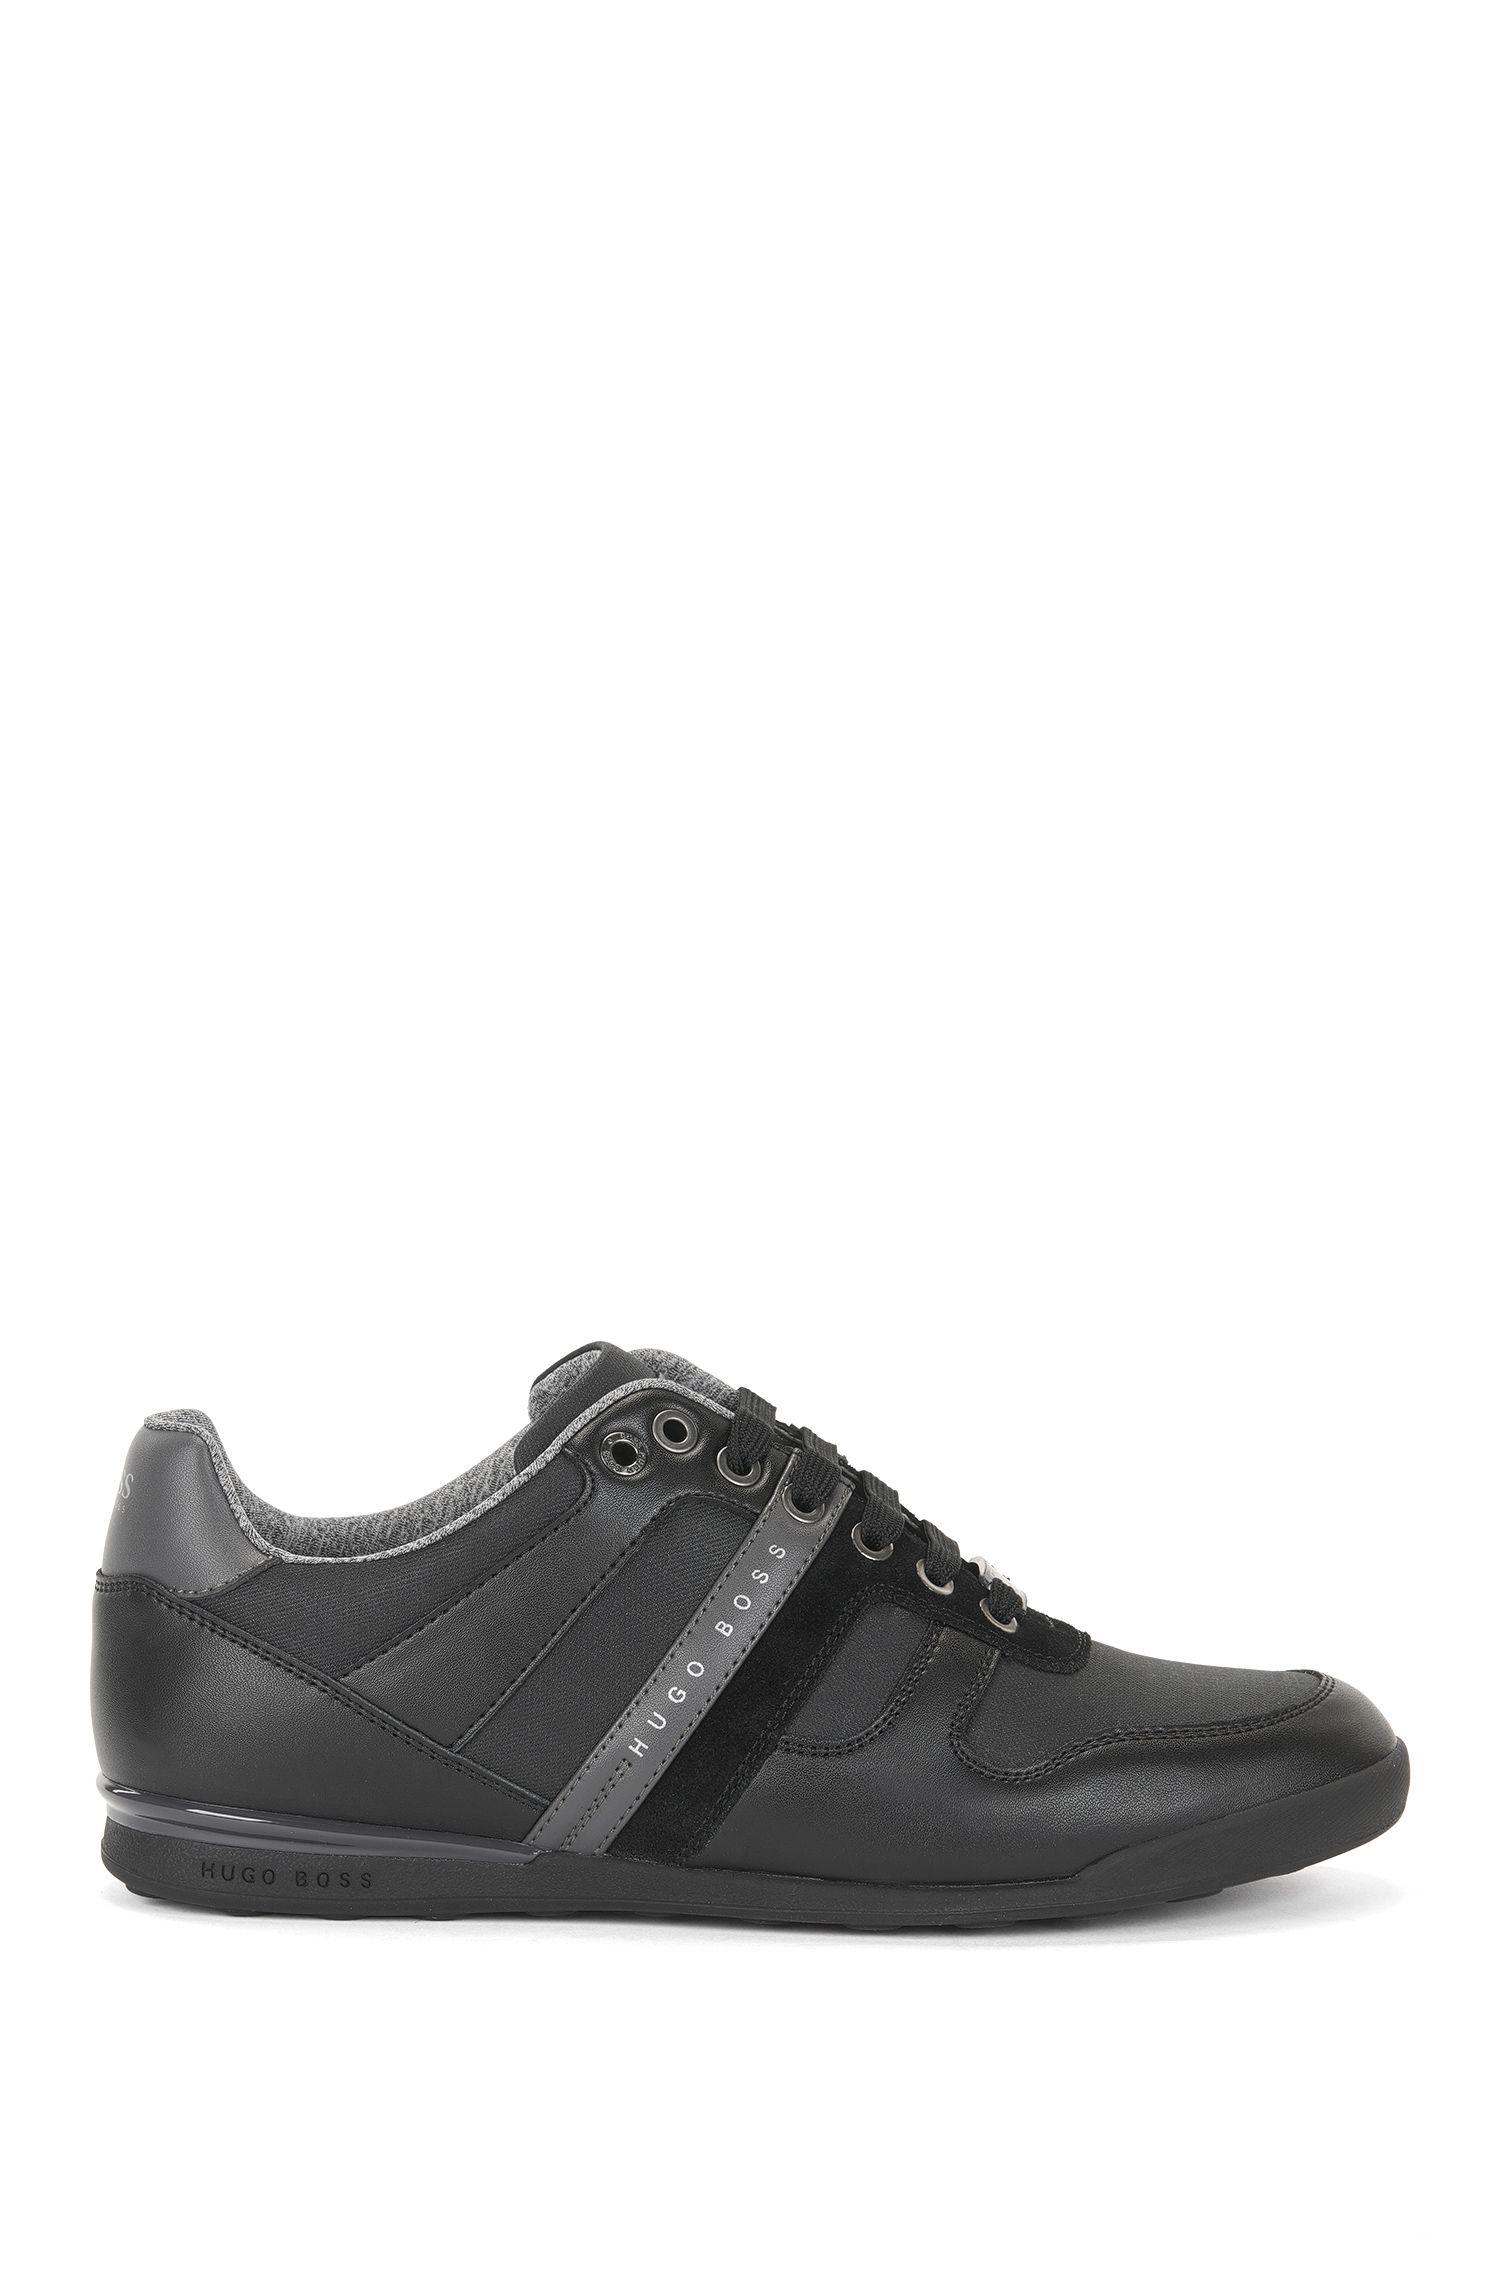 Sneakers low-top in pelle e inserti in denim